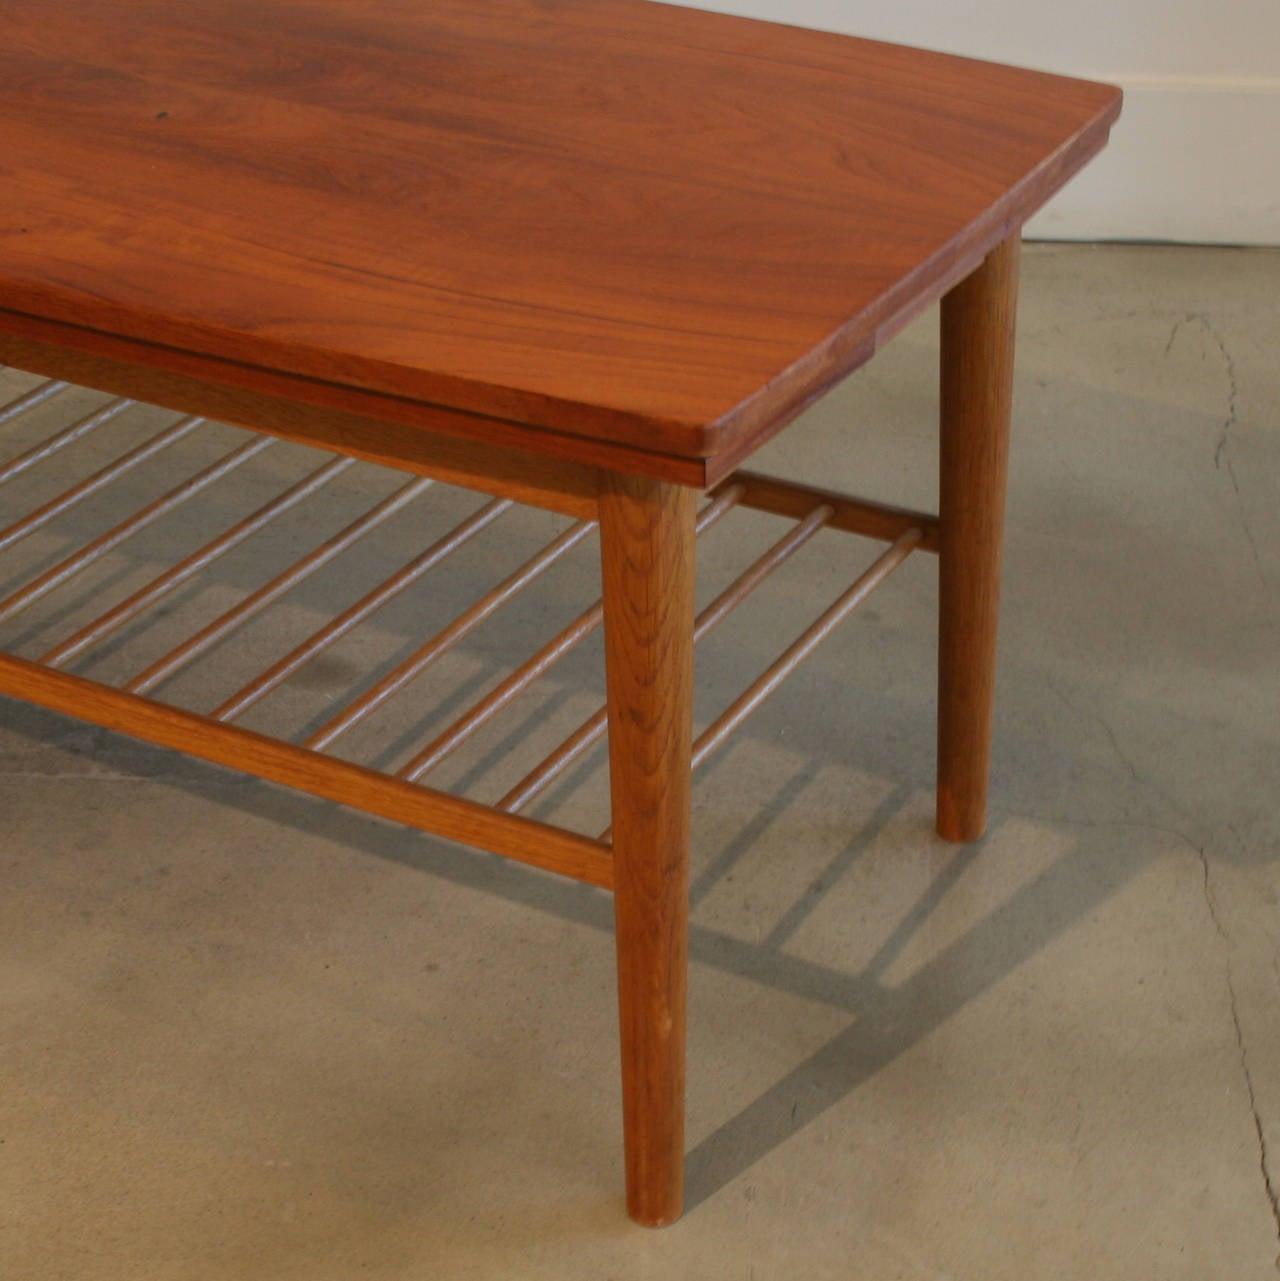 Vintage Danish Mahogany Coffee Table At 1stdibs